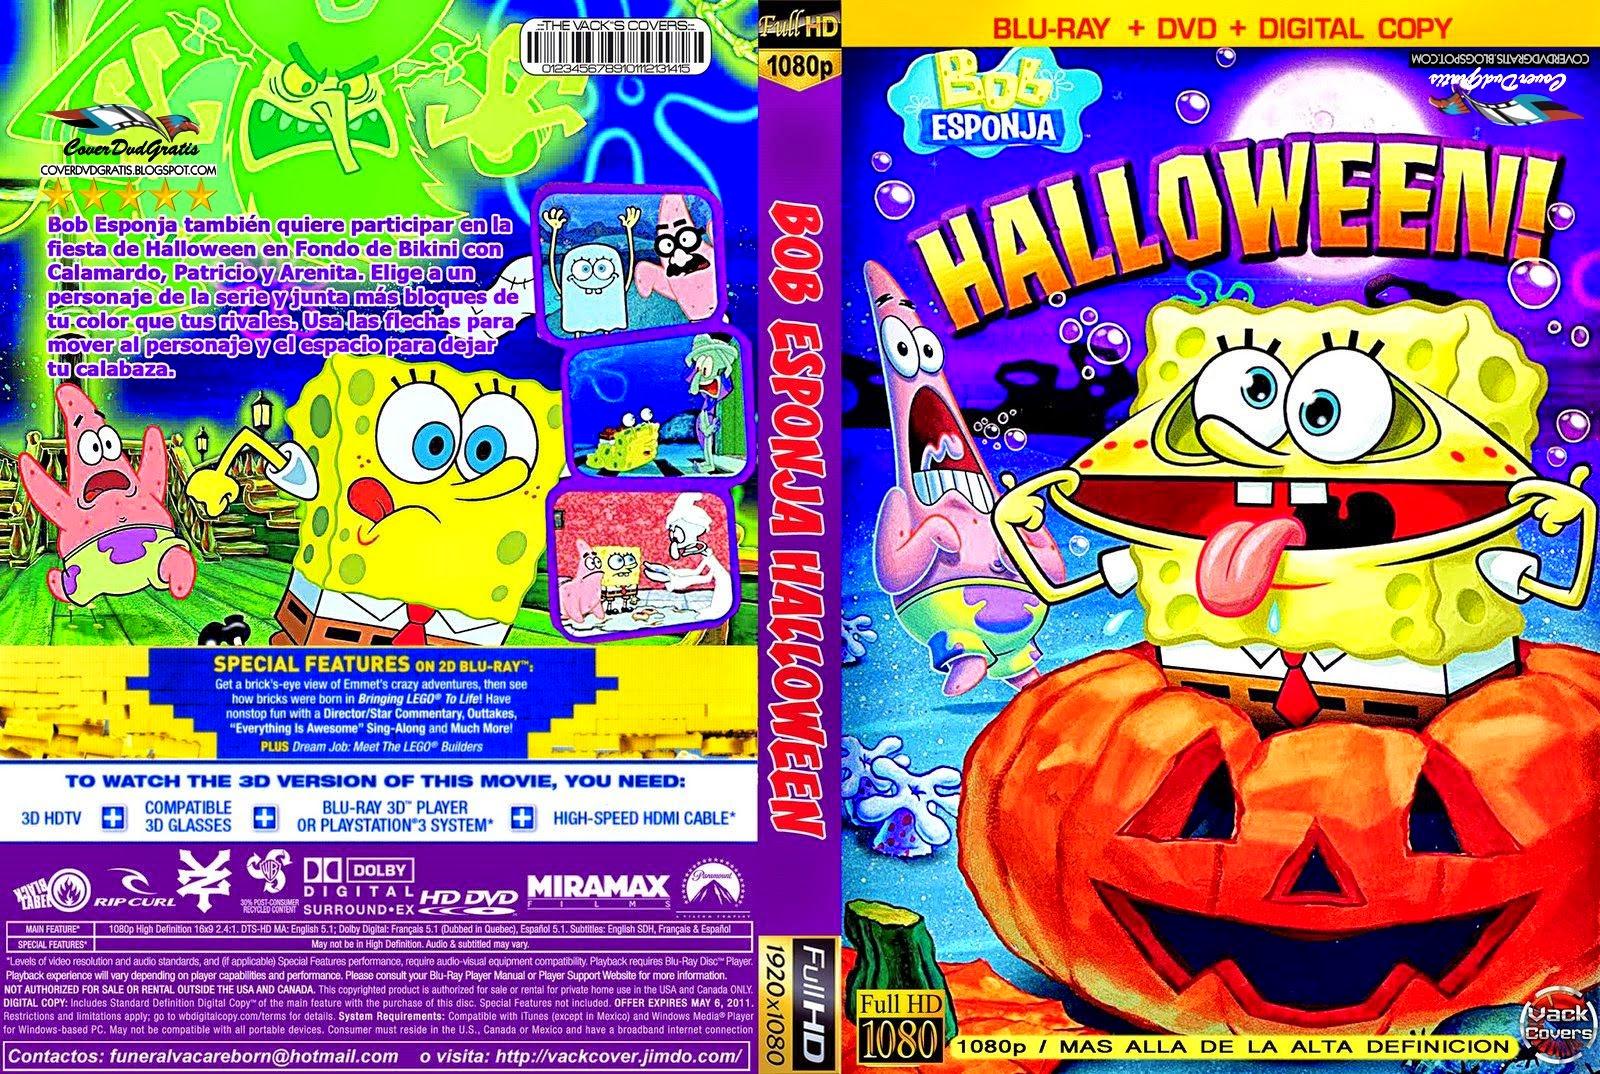 Bob Esponja Halloween 2014 DVD COVER  CoverDvdGratis